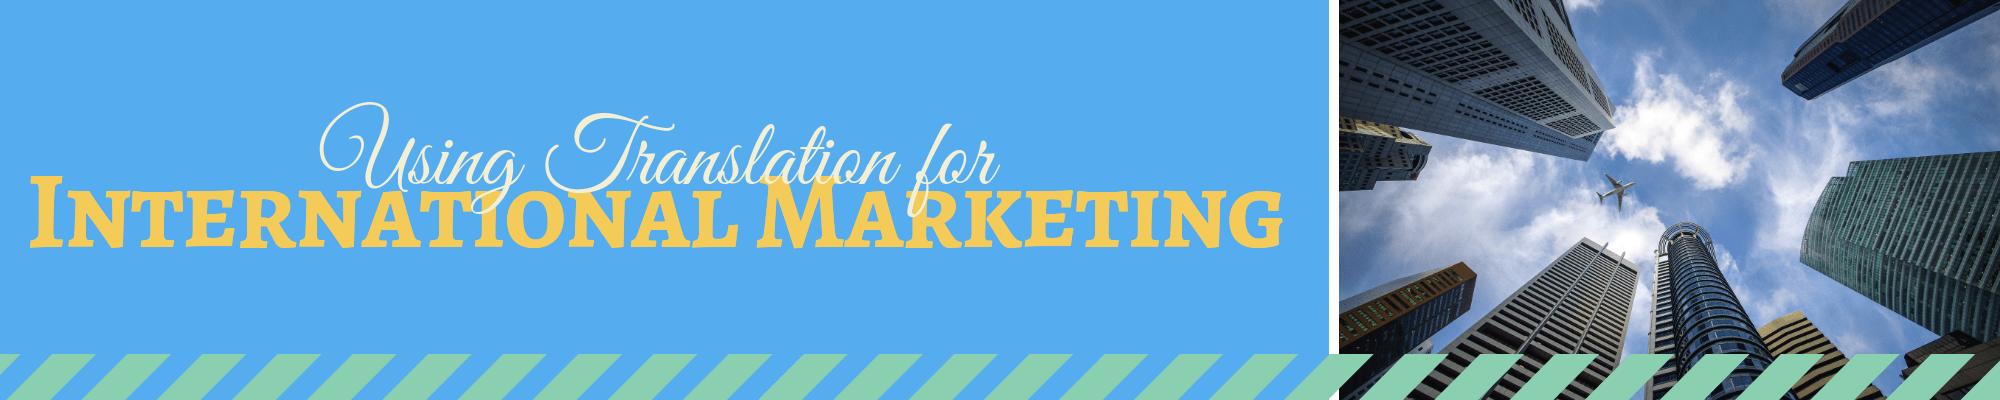 Using Translation in International Marketing